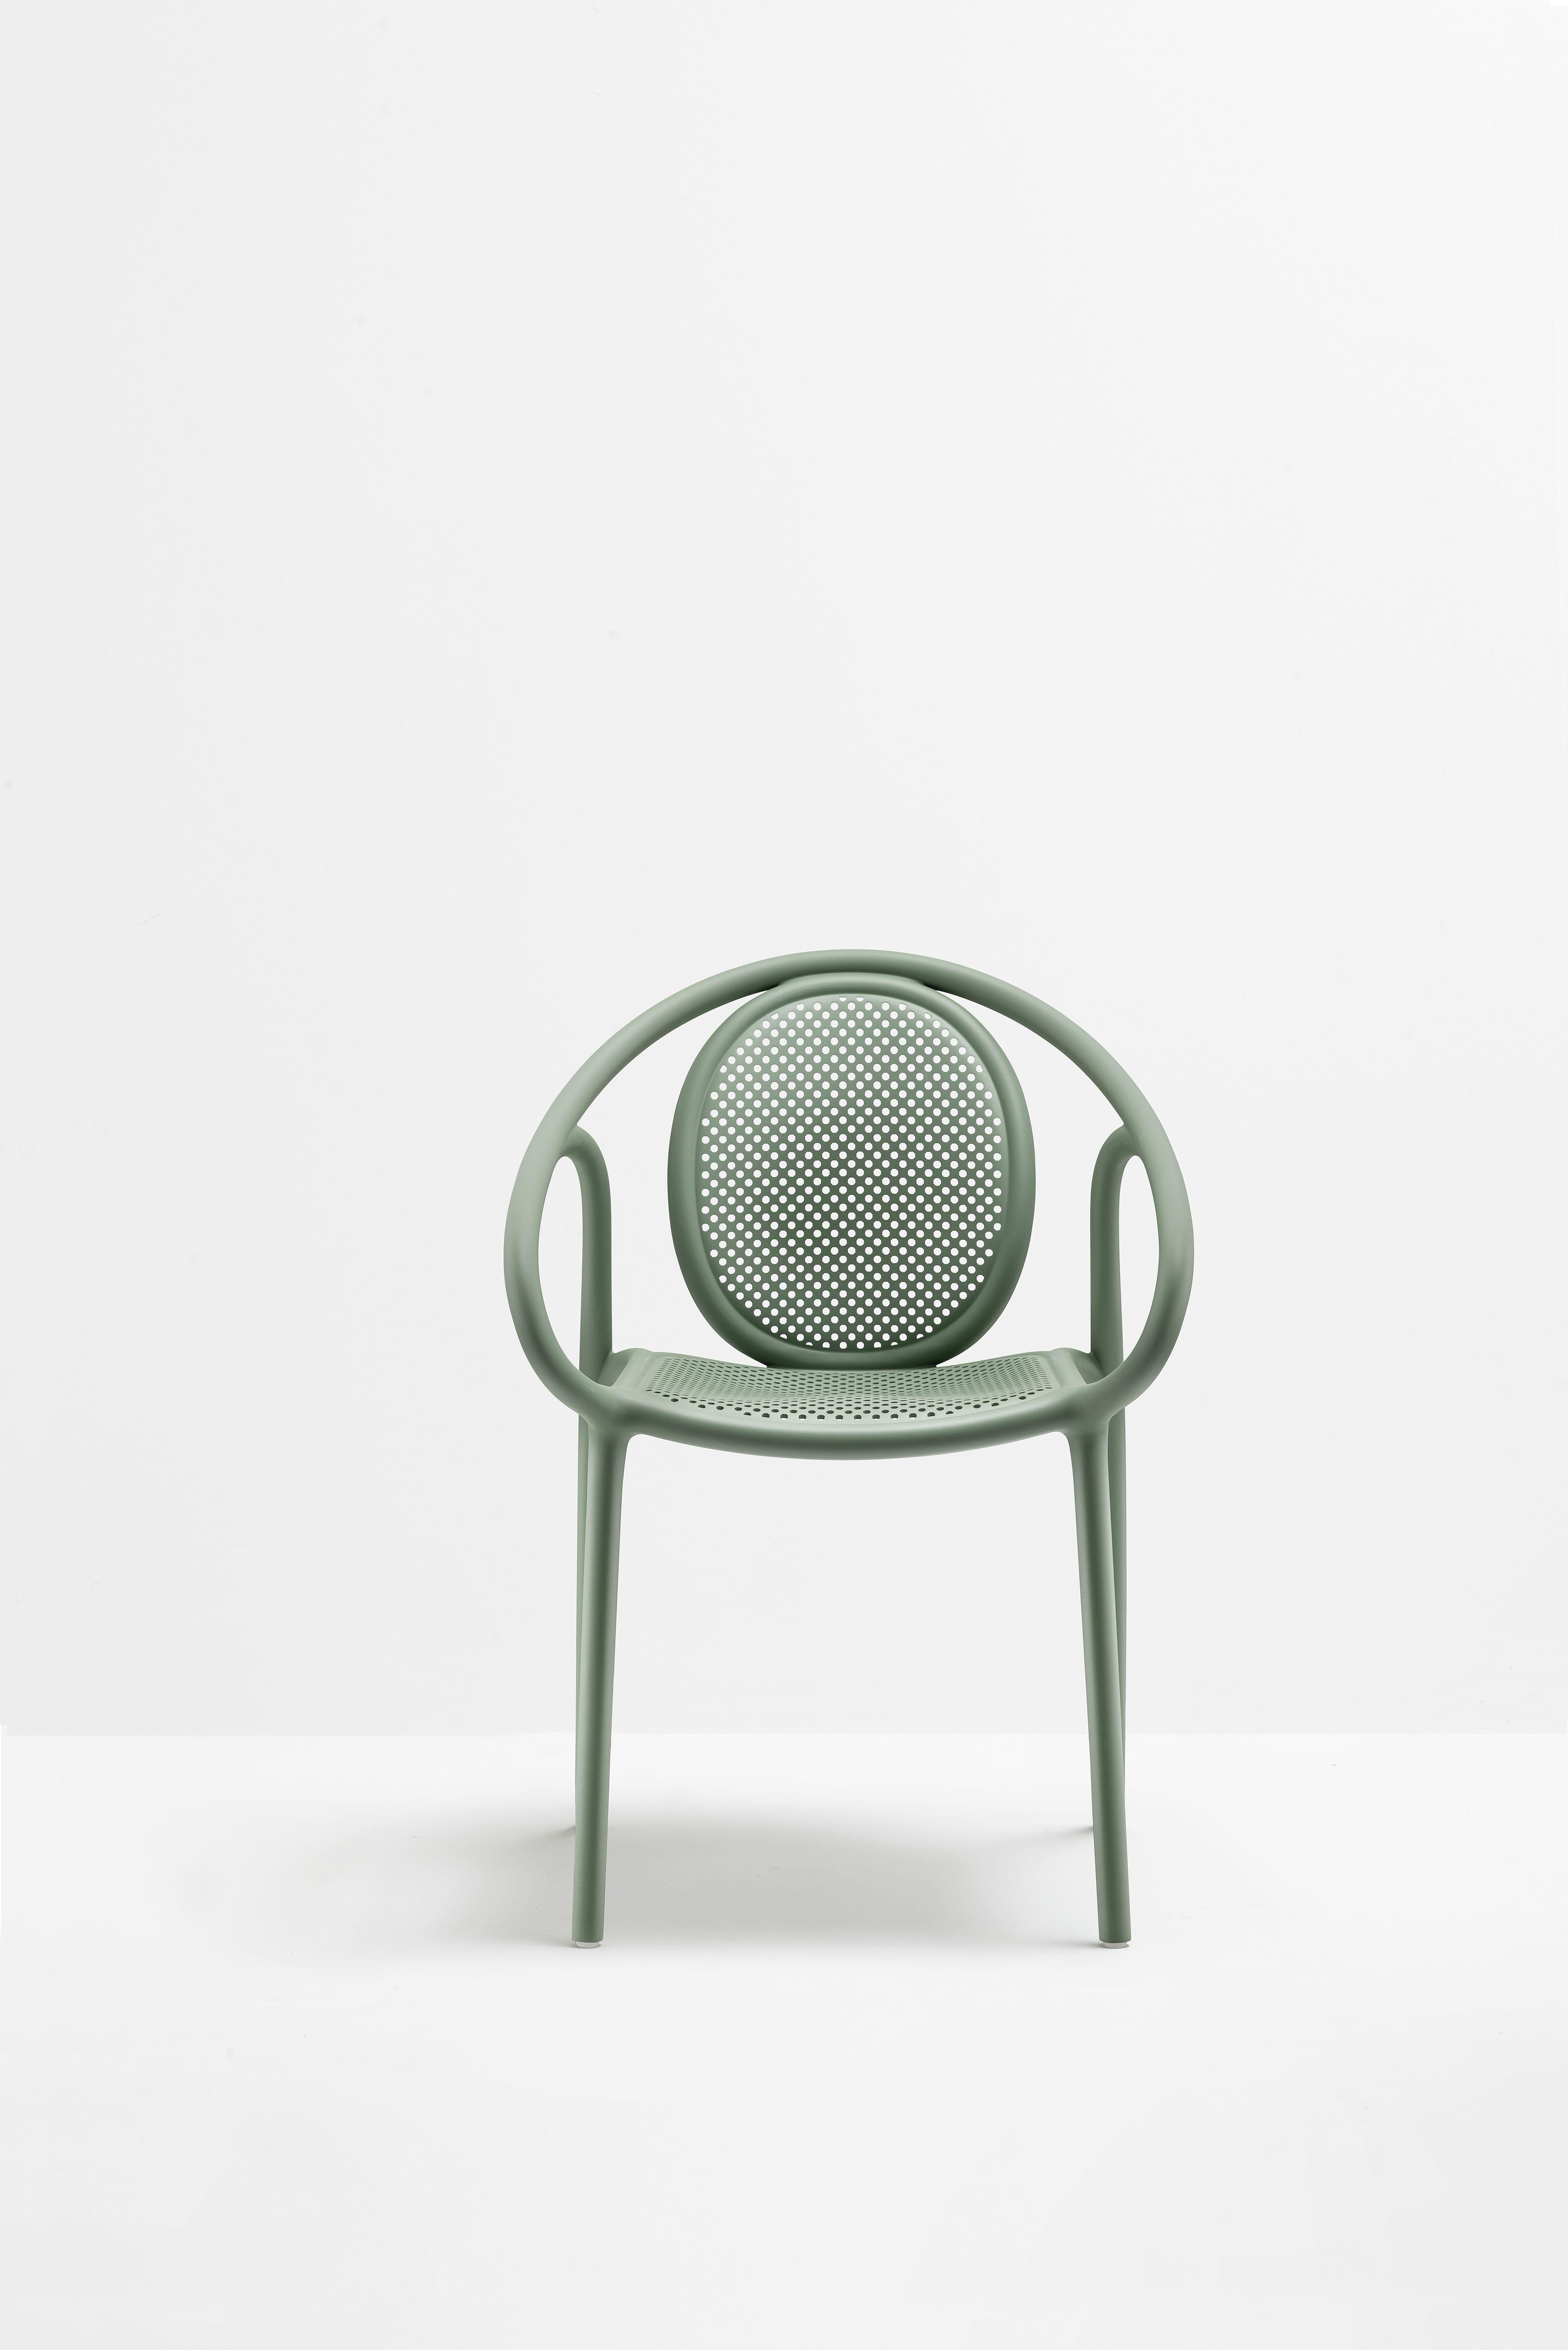 kettal cala dining chair farm patio dining chairs garden rh pinterest com